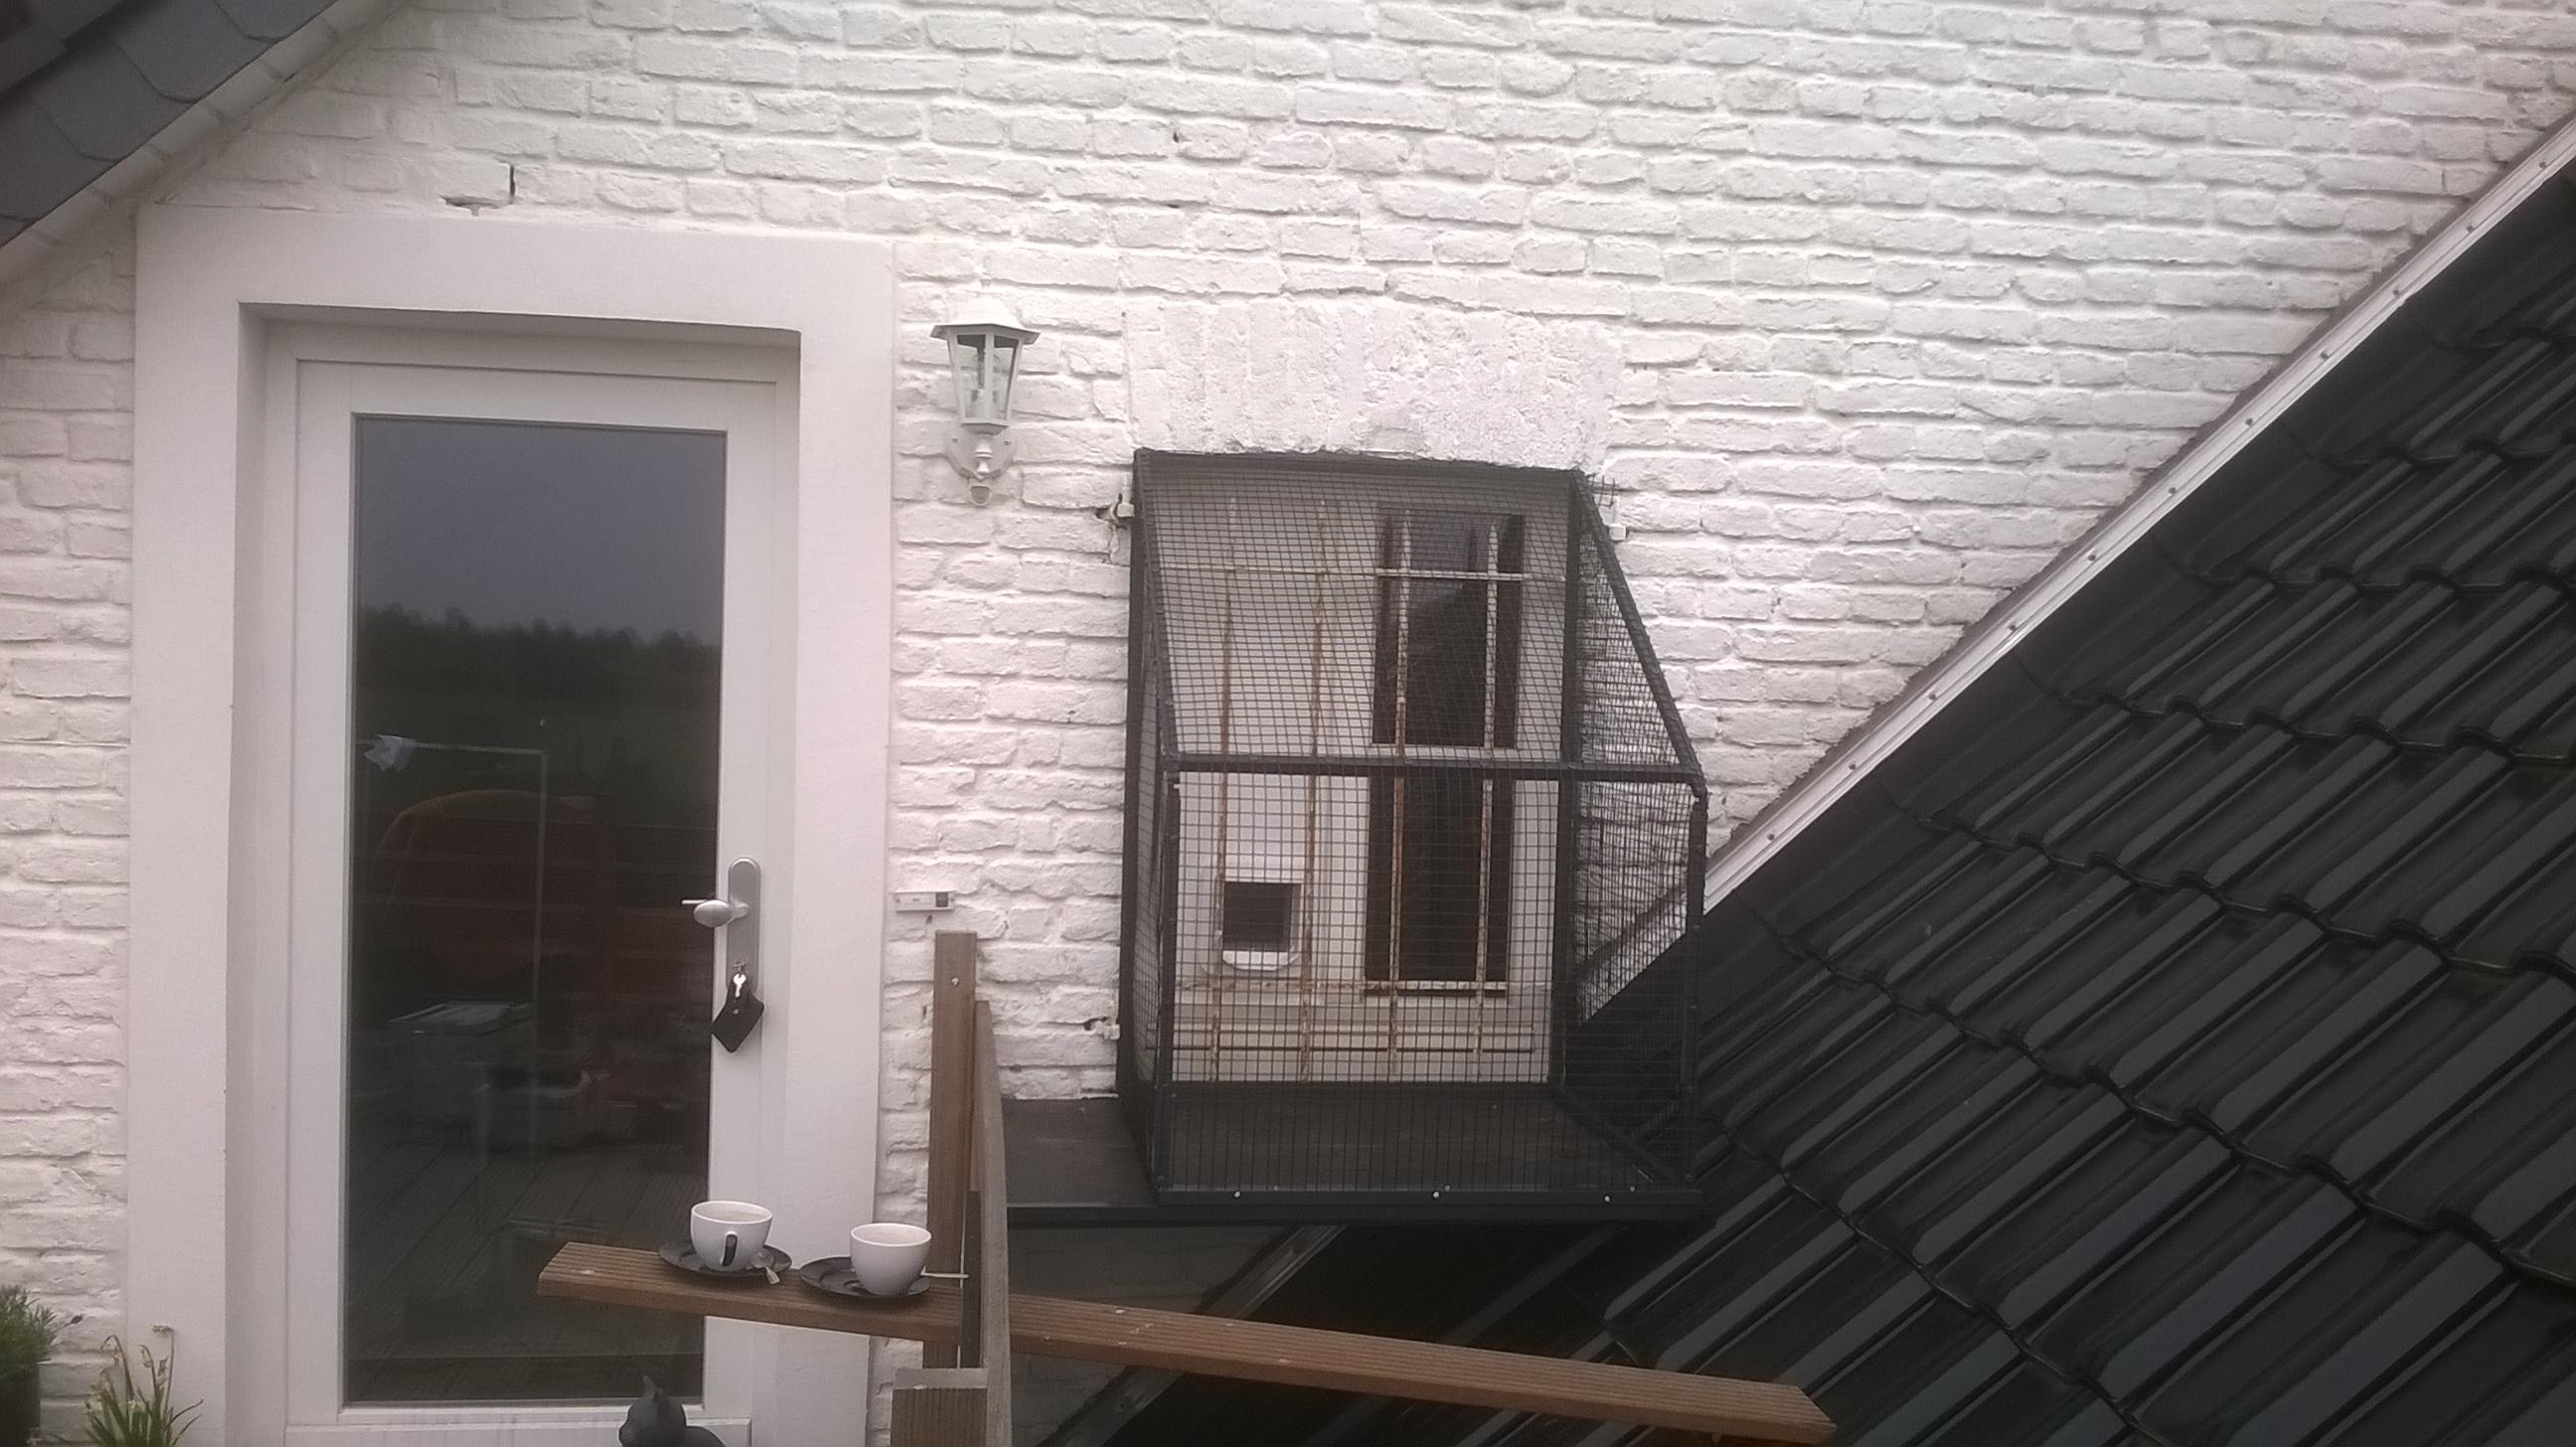 Katzenbalkon-mit-Katzenklappe